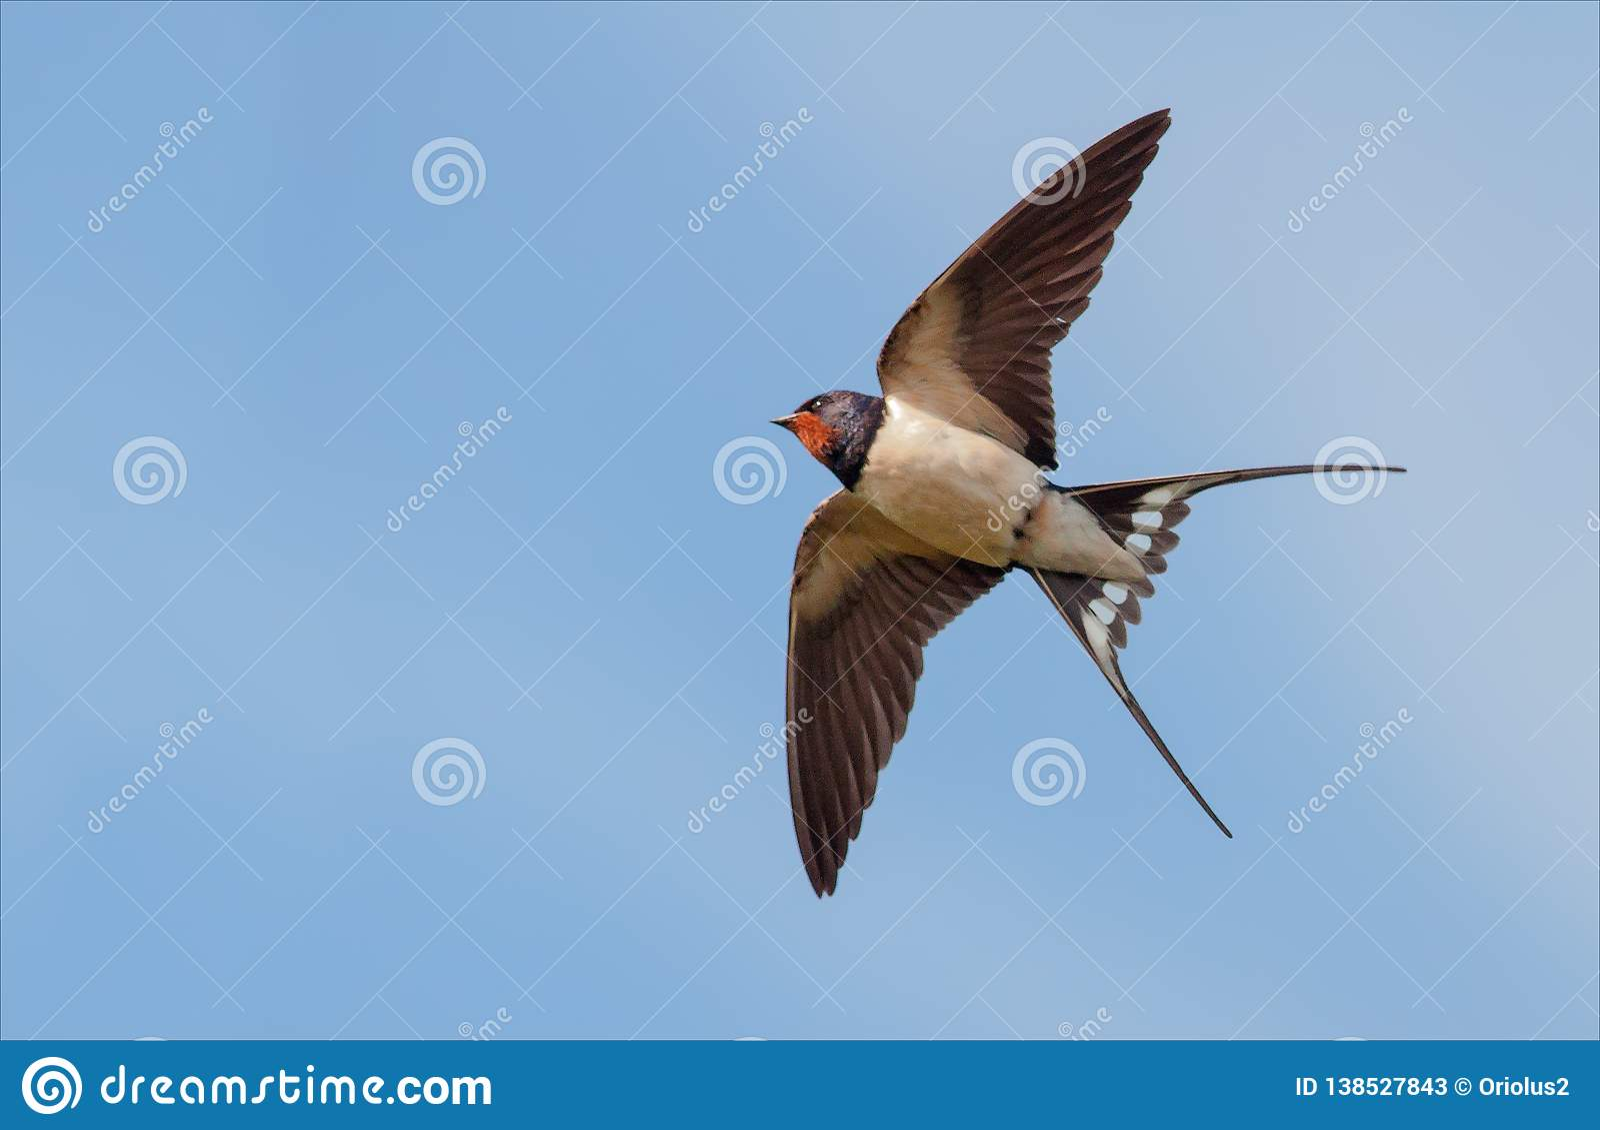 Boerenzwaluw vliegen in blauwe hemel met uitgerekte vleugels